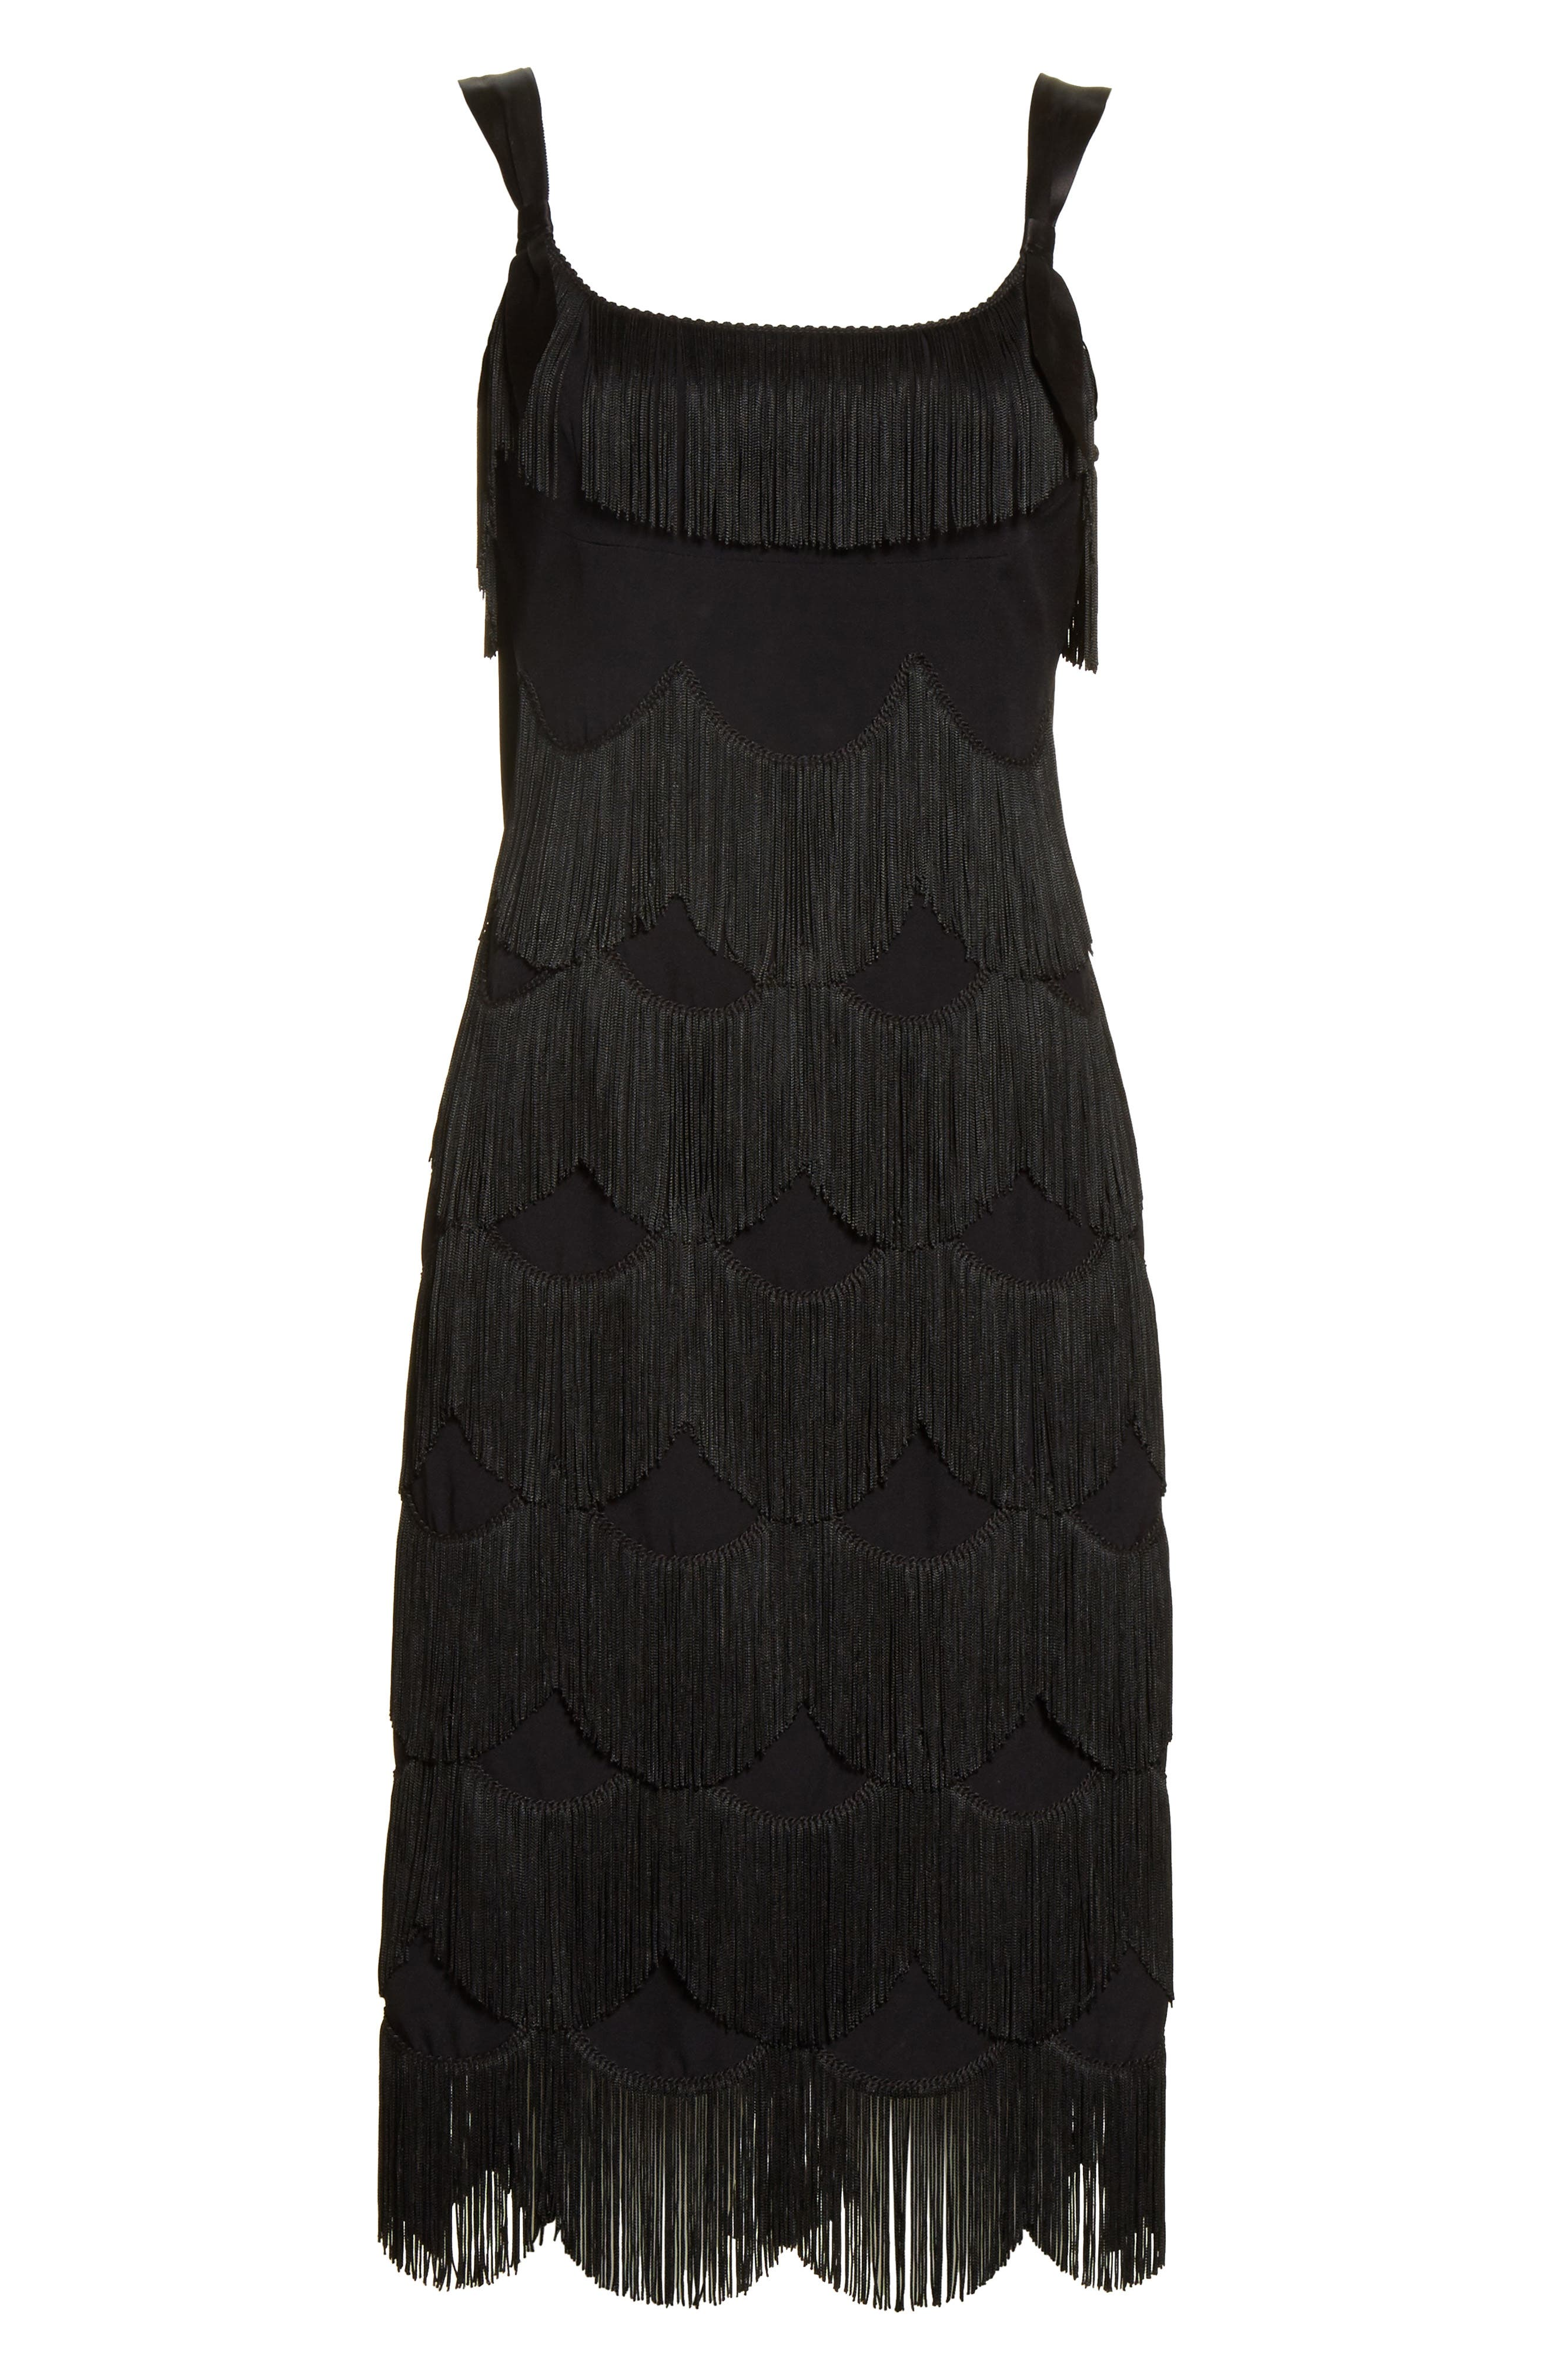 Scalloped Fringe Party Dress,                             Alternate thumbnail 6, color,                             001